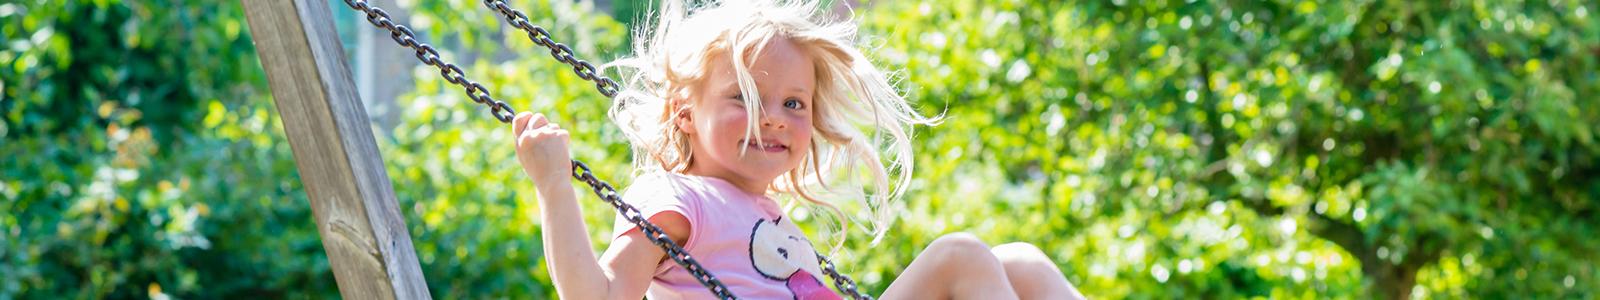 MiriamRijhinerFotografie-opthofHR21078-1_1600x300